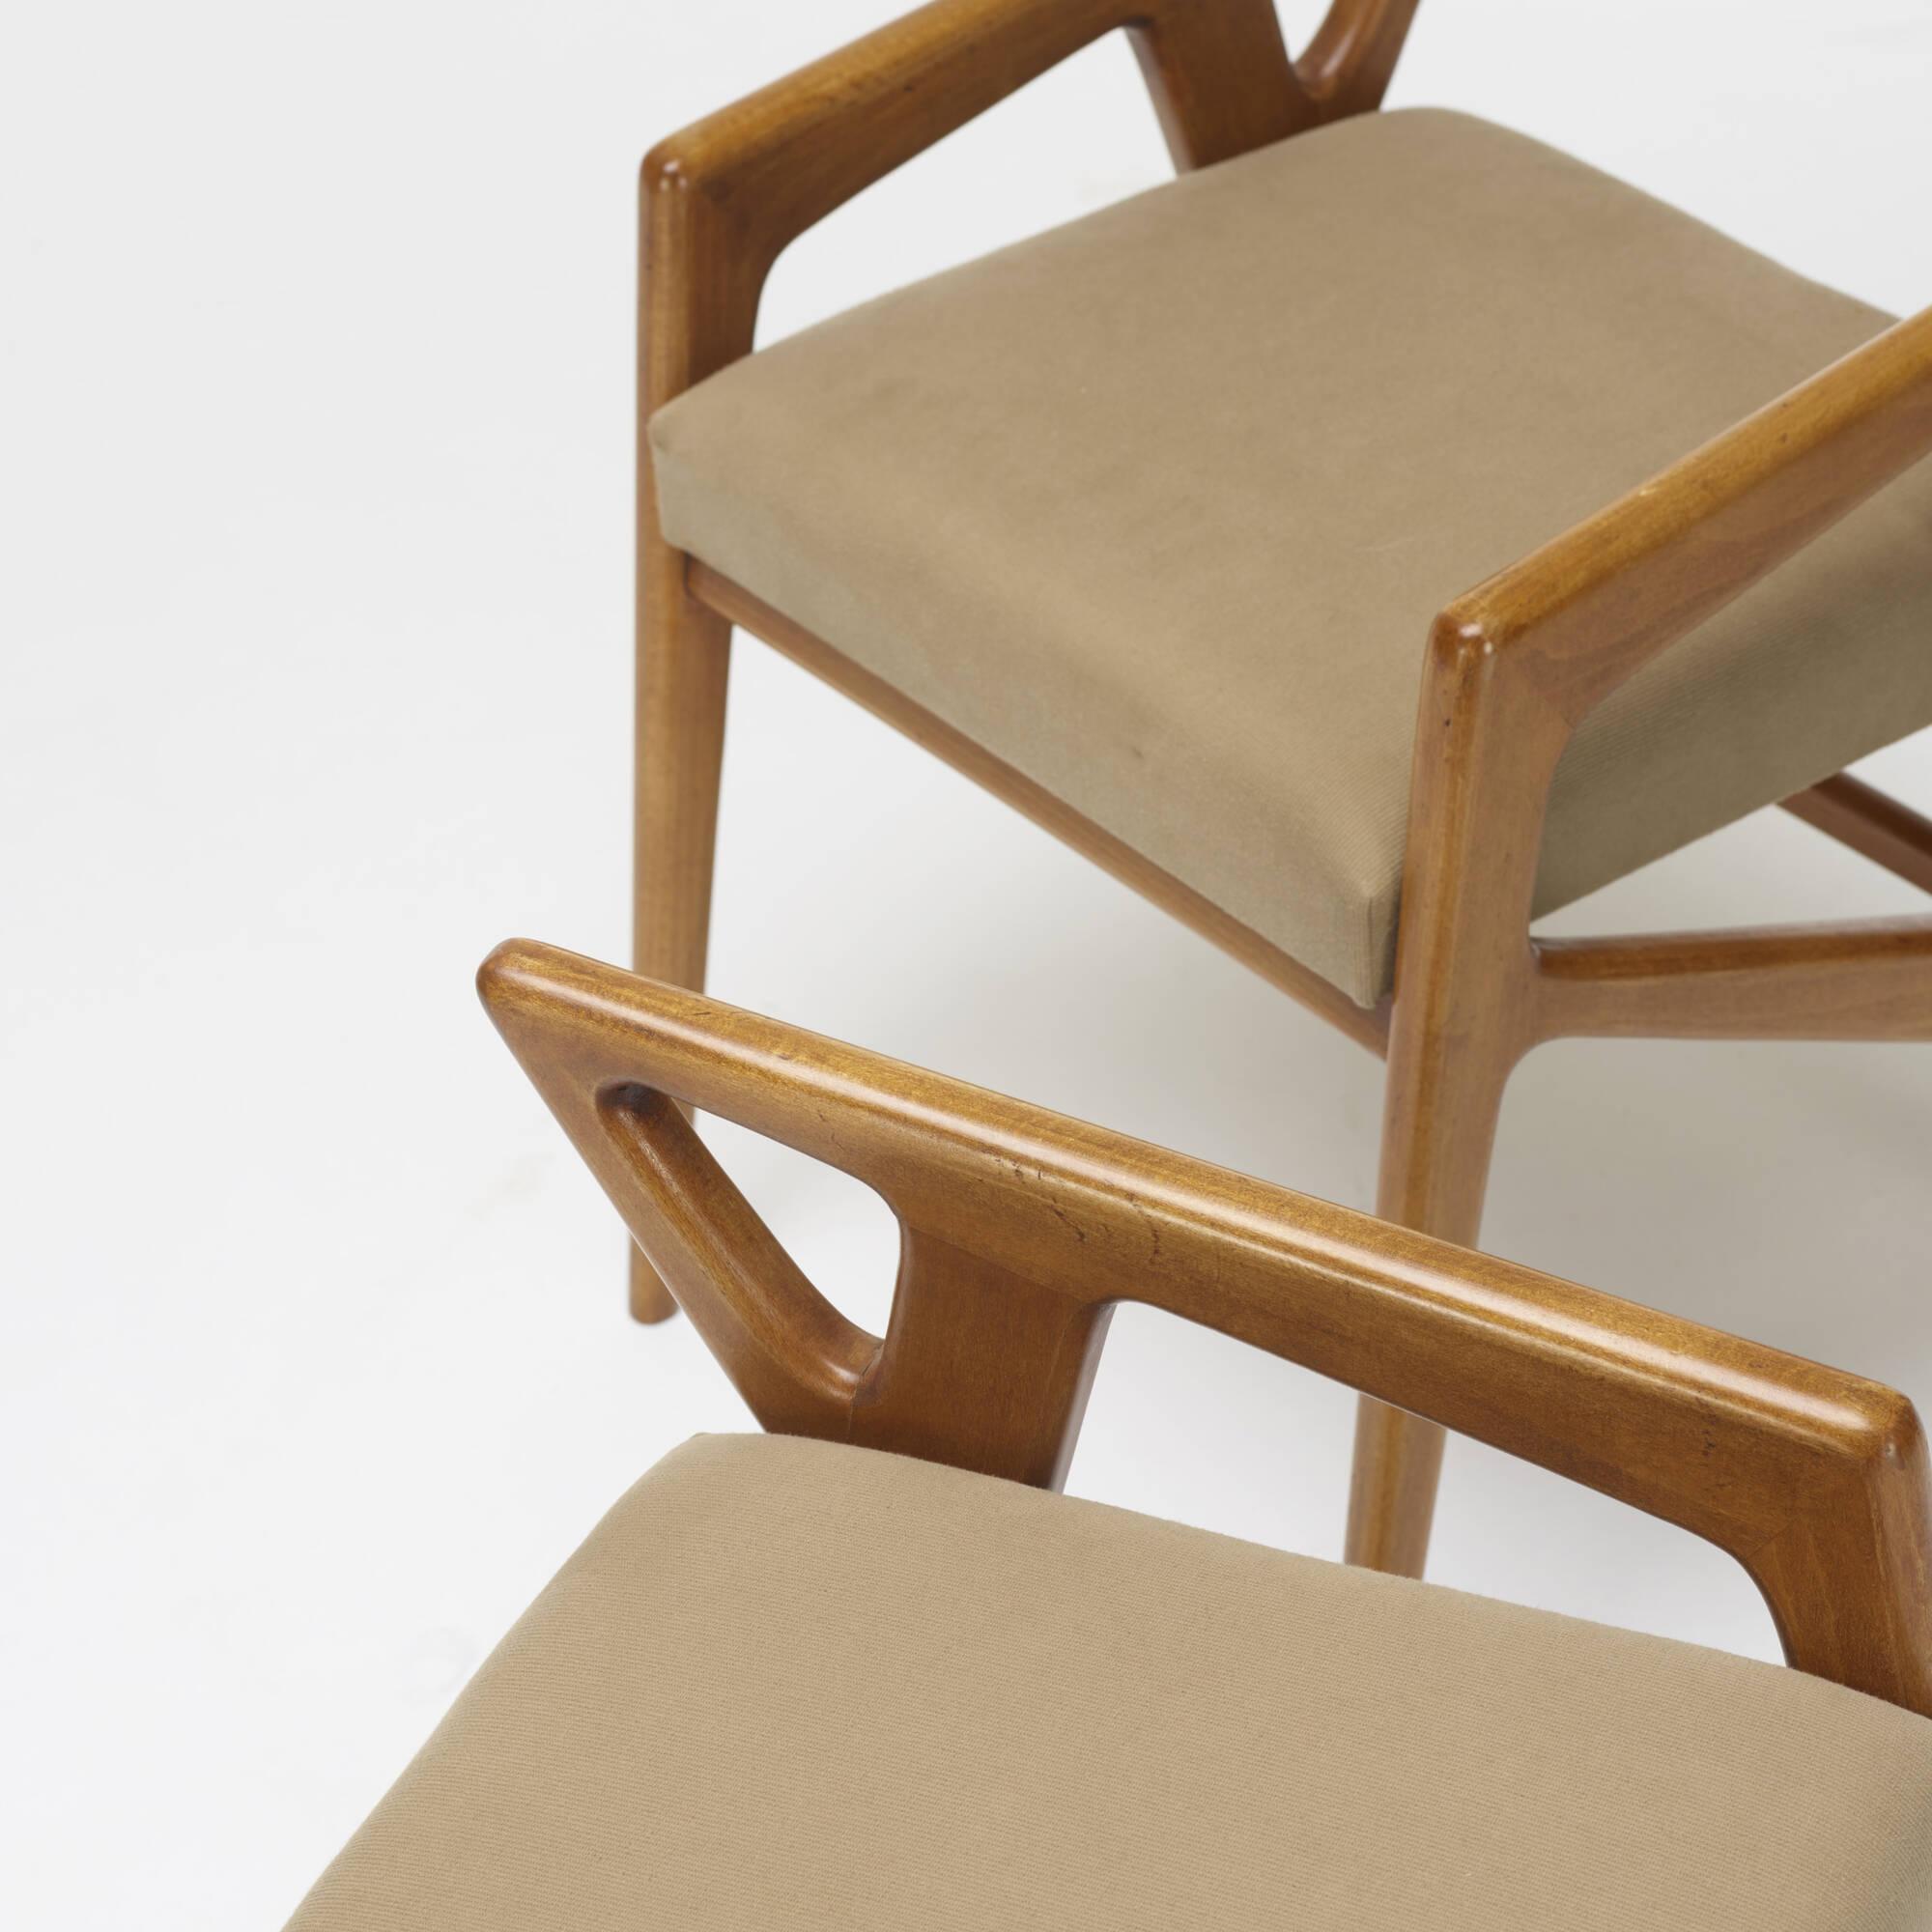 202: Gio Ponti / benches, pair (3 of 3)